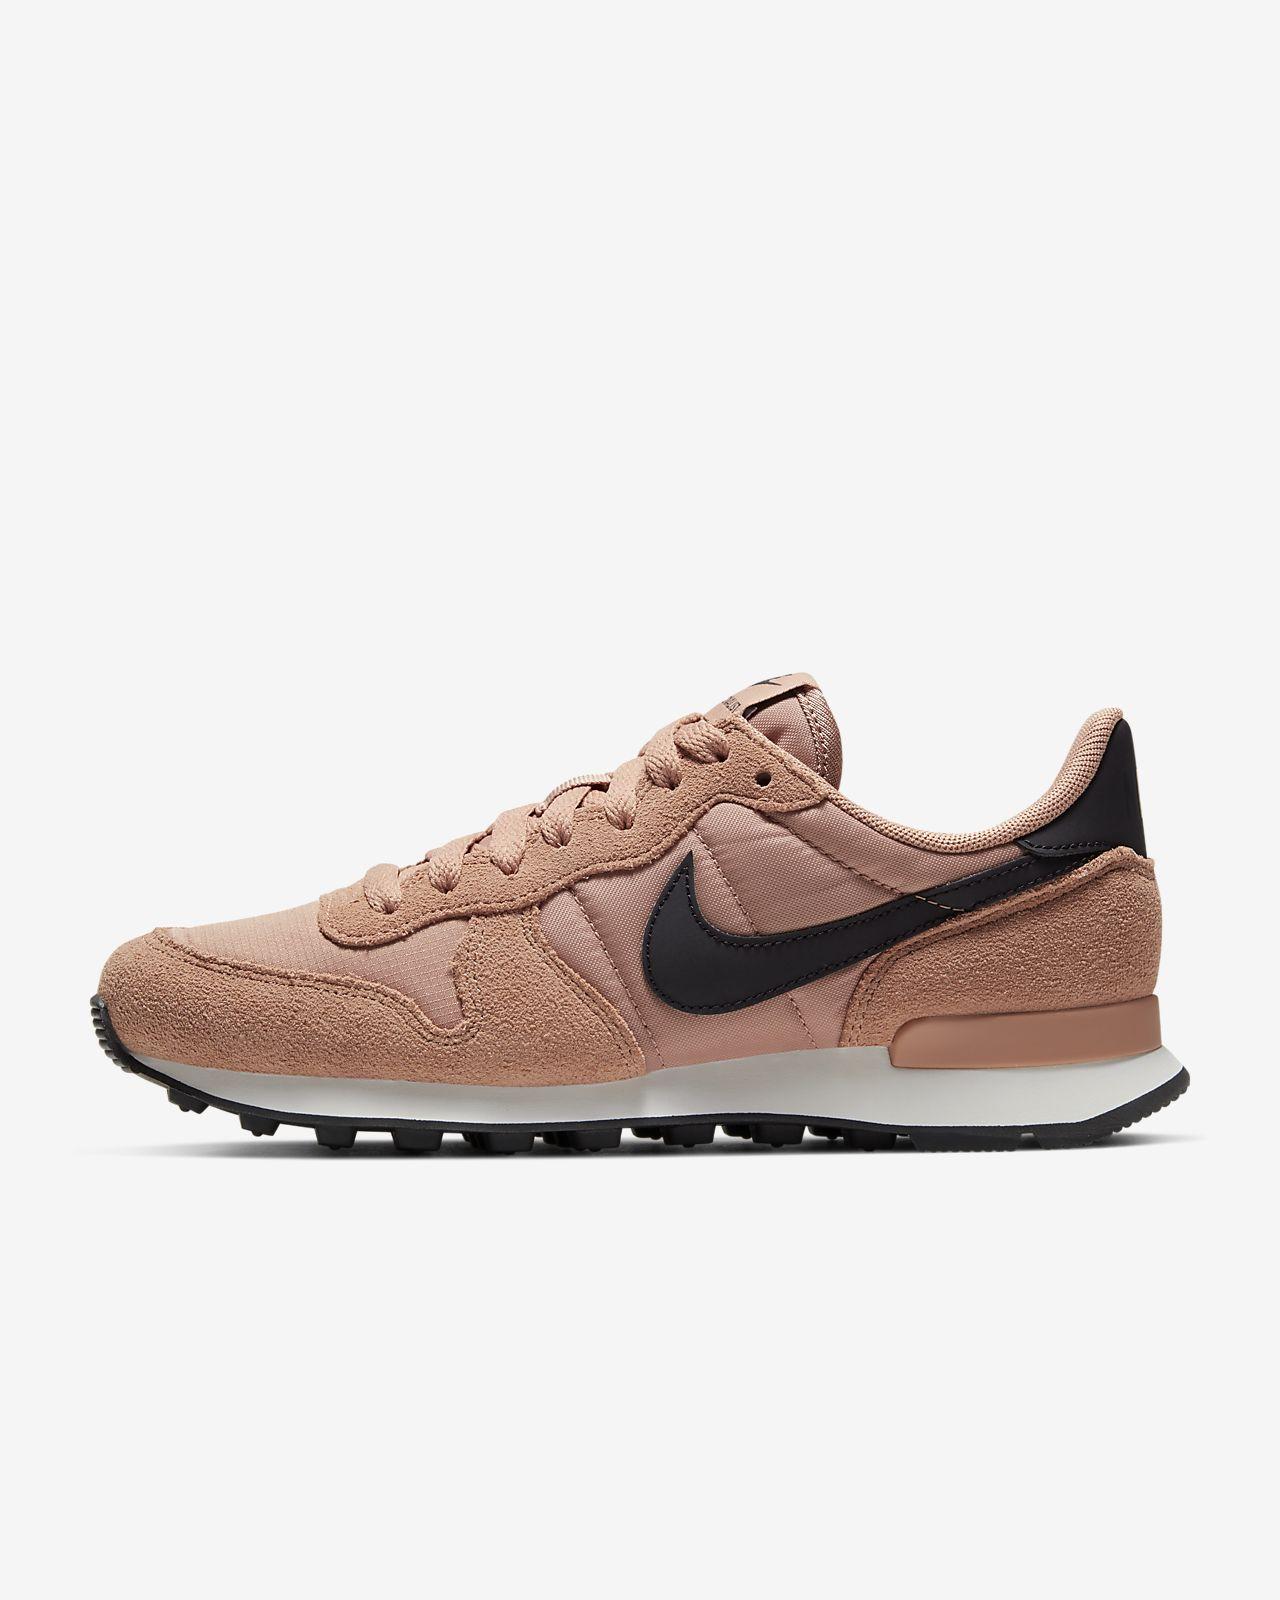 sale retailer f8bbe 15870 Low Resolution Nike Internationalist Zapatillas - Mujer Nike  Internationalist Zapatillas - Mujer